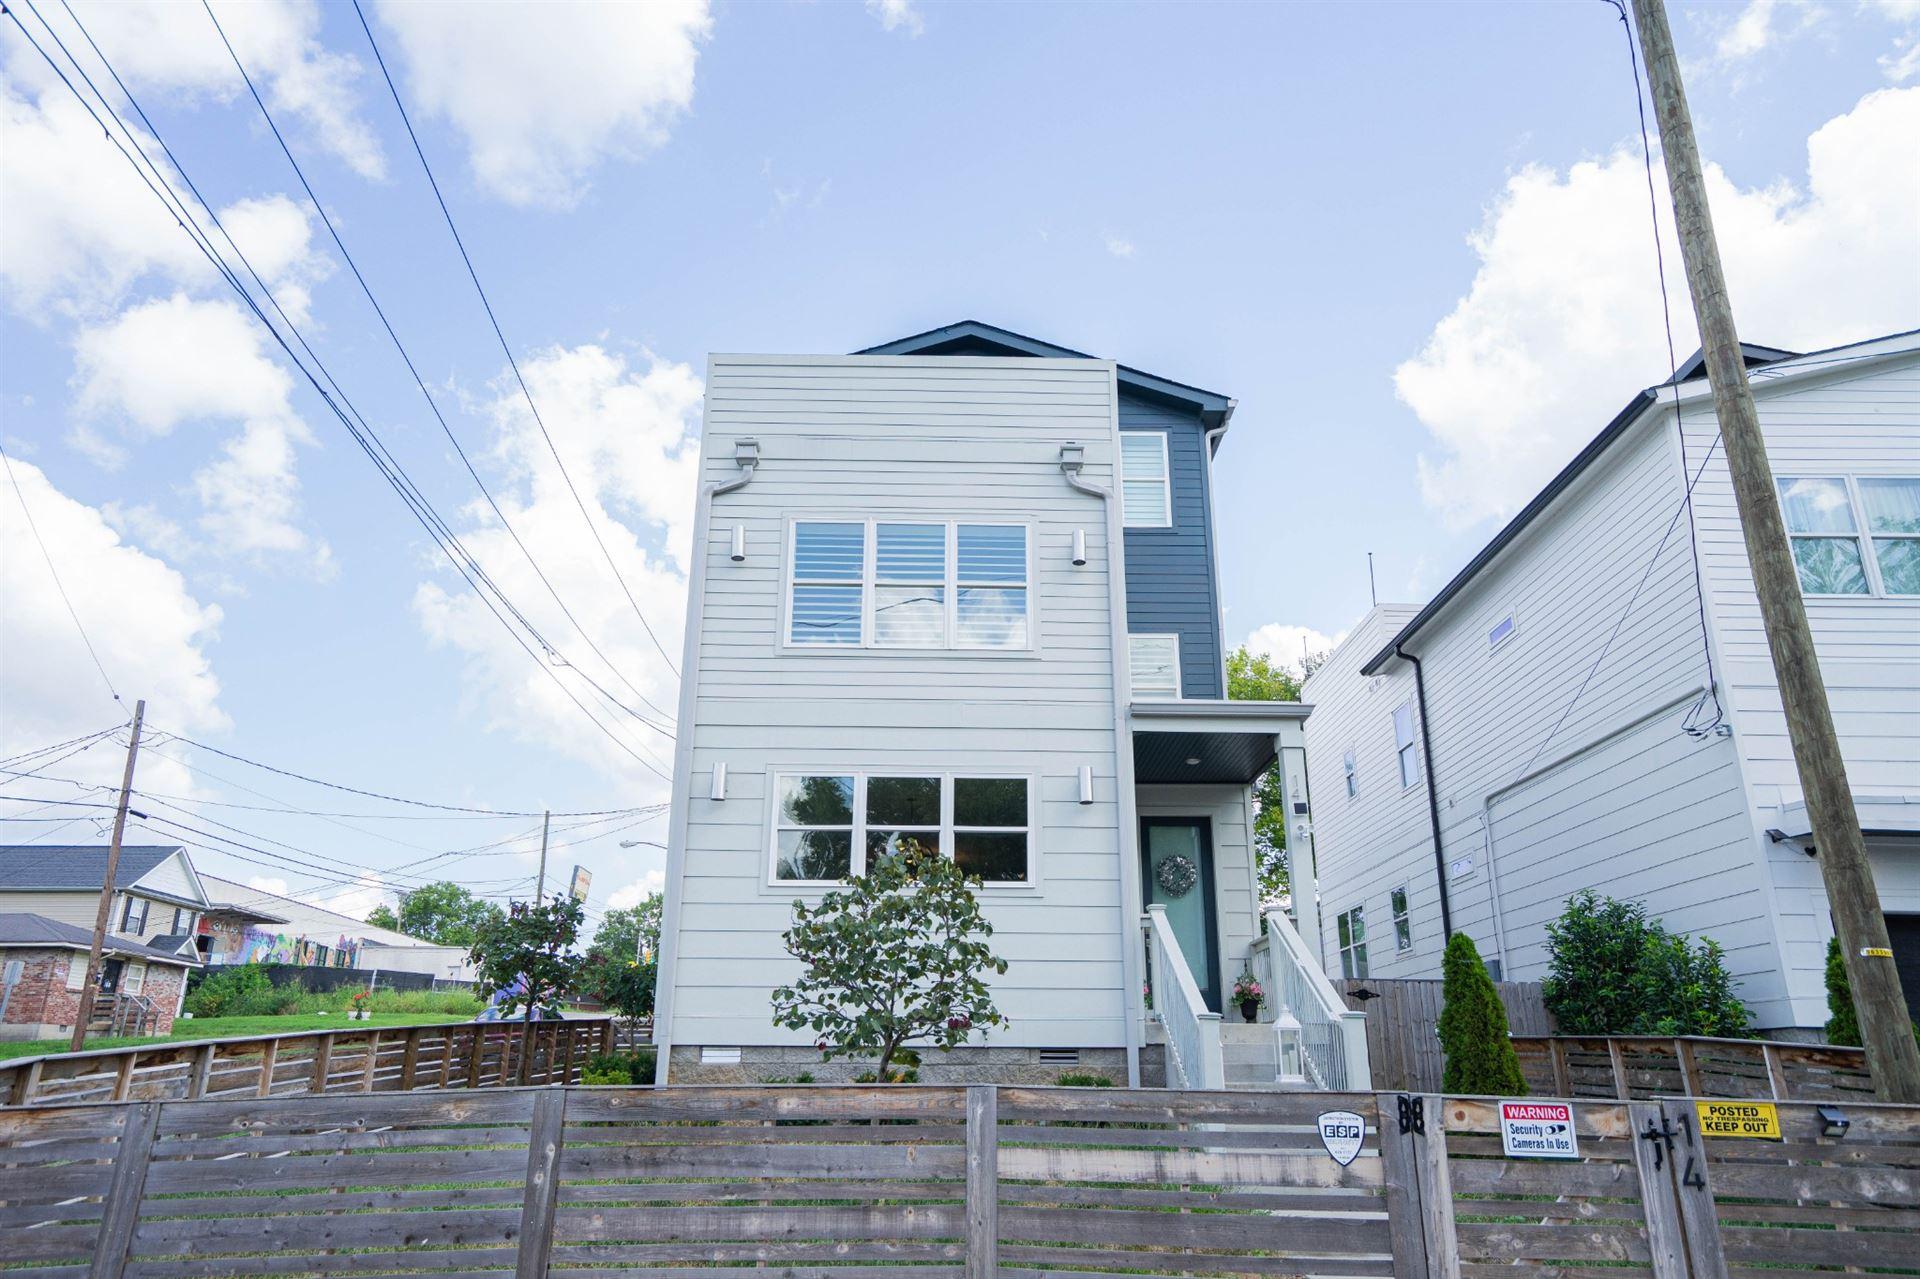 14 Perkins St, Nashville, TN 37210 - MLS#: 2286349